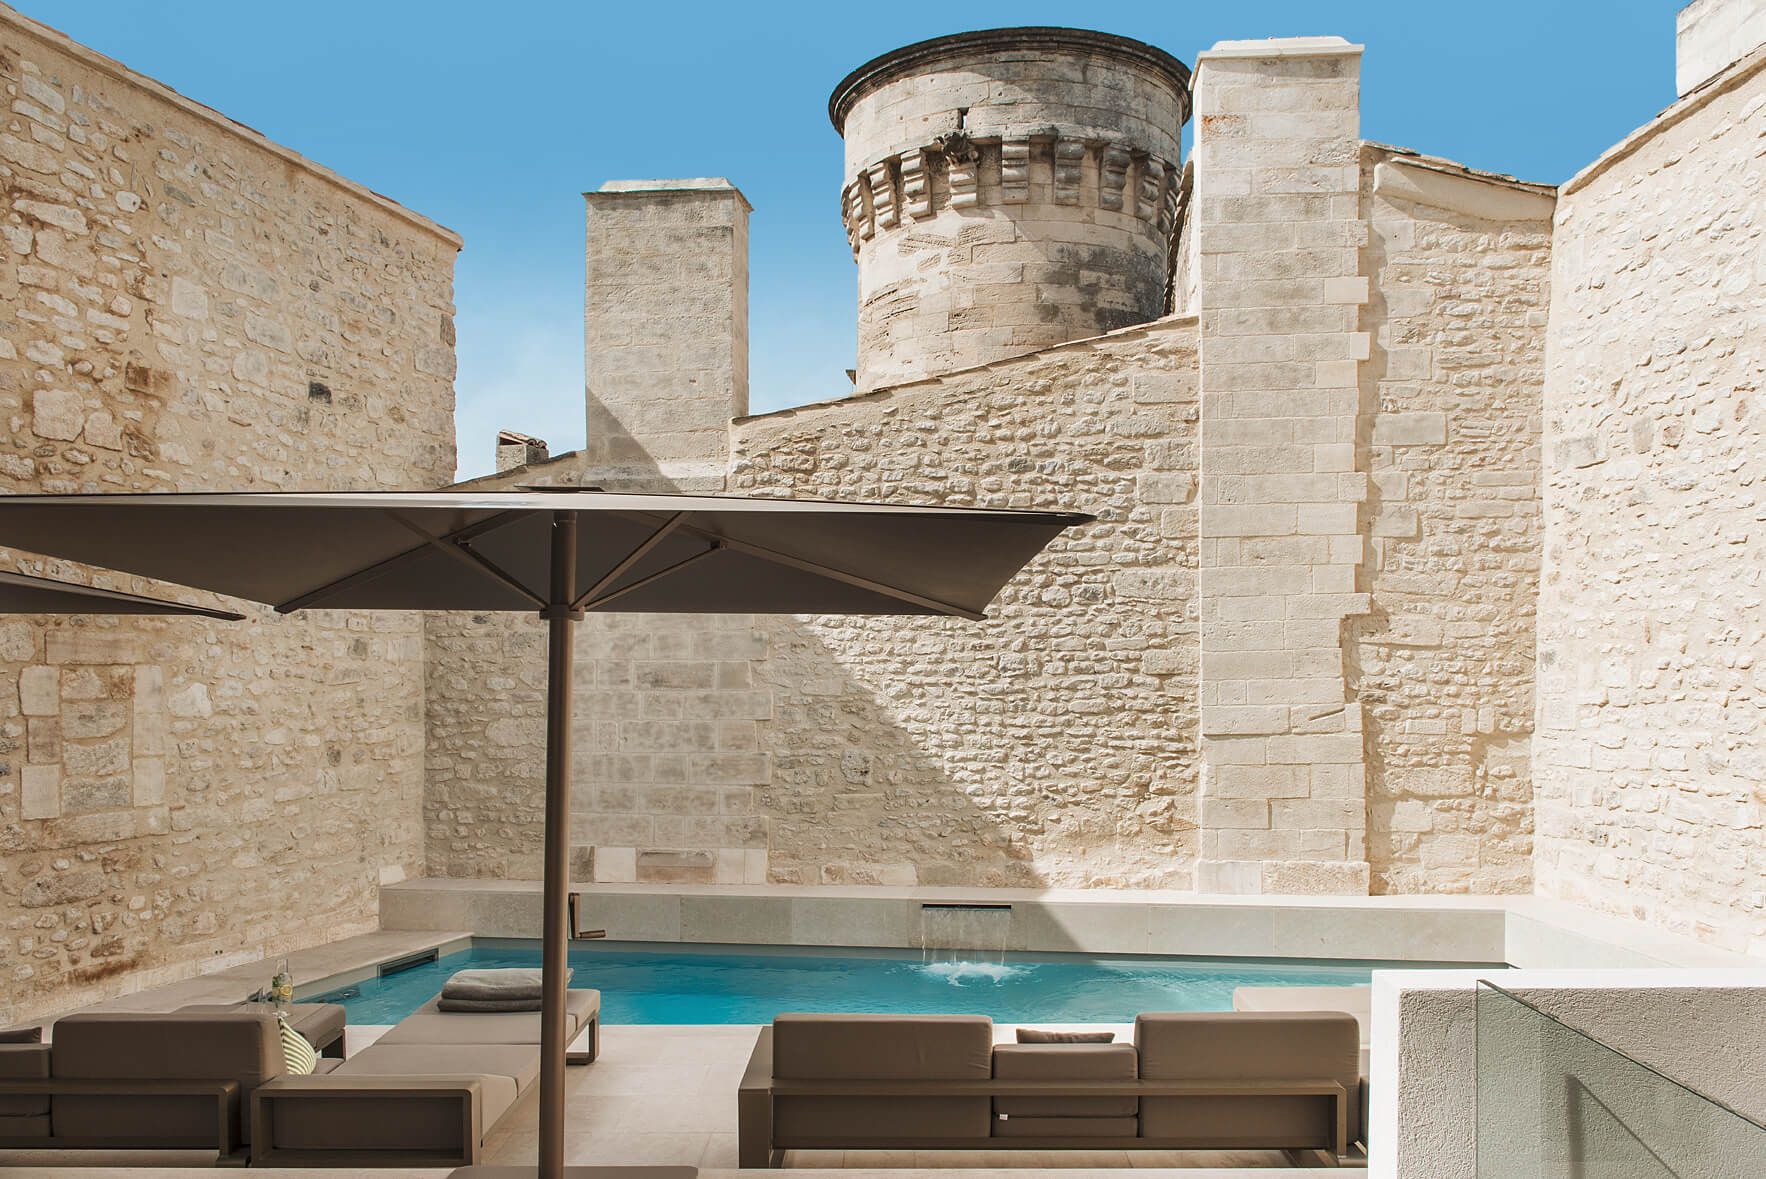 hotel-de-tourrel_pool-terrace-2.jpg